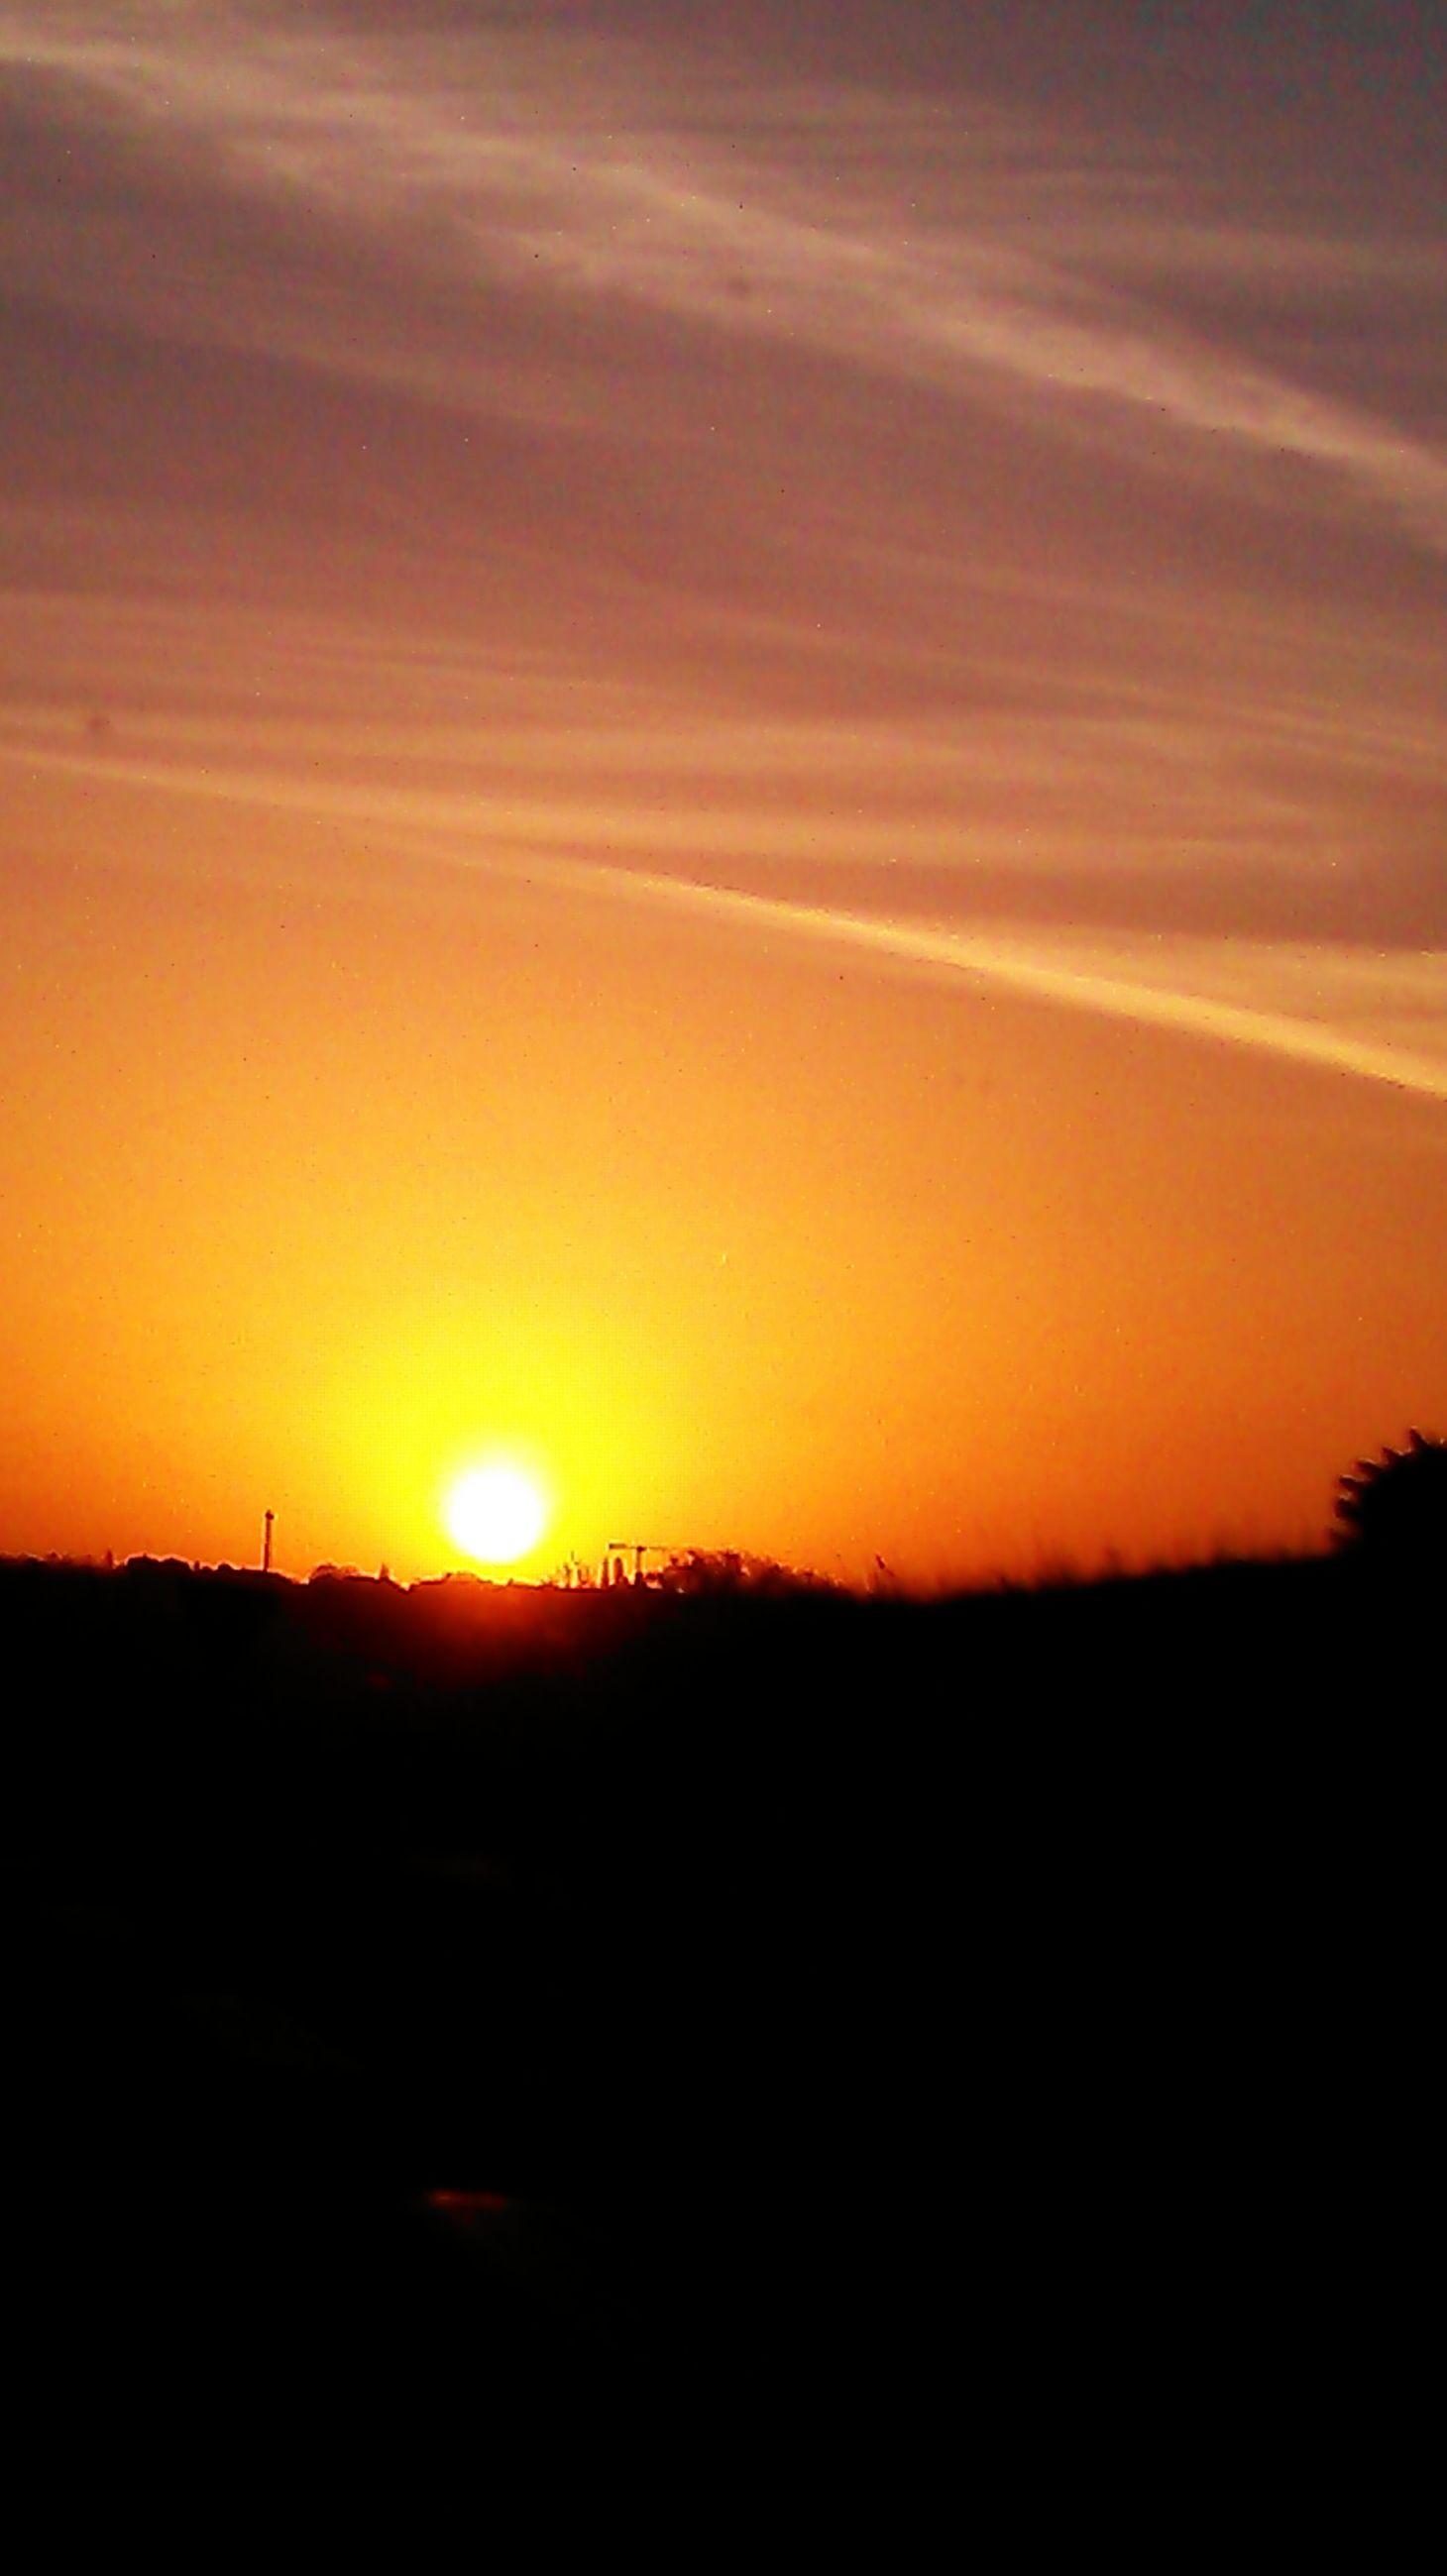 sunset, silhouette, orange color, sun, scenics, tranquil scene, beauty in nature, tranquility, landscape, sky, idyllic, nature, copy space, sunlight, horizon over land, dark, outdoors, dramatic sky, field, majestic